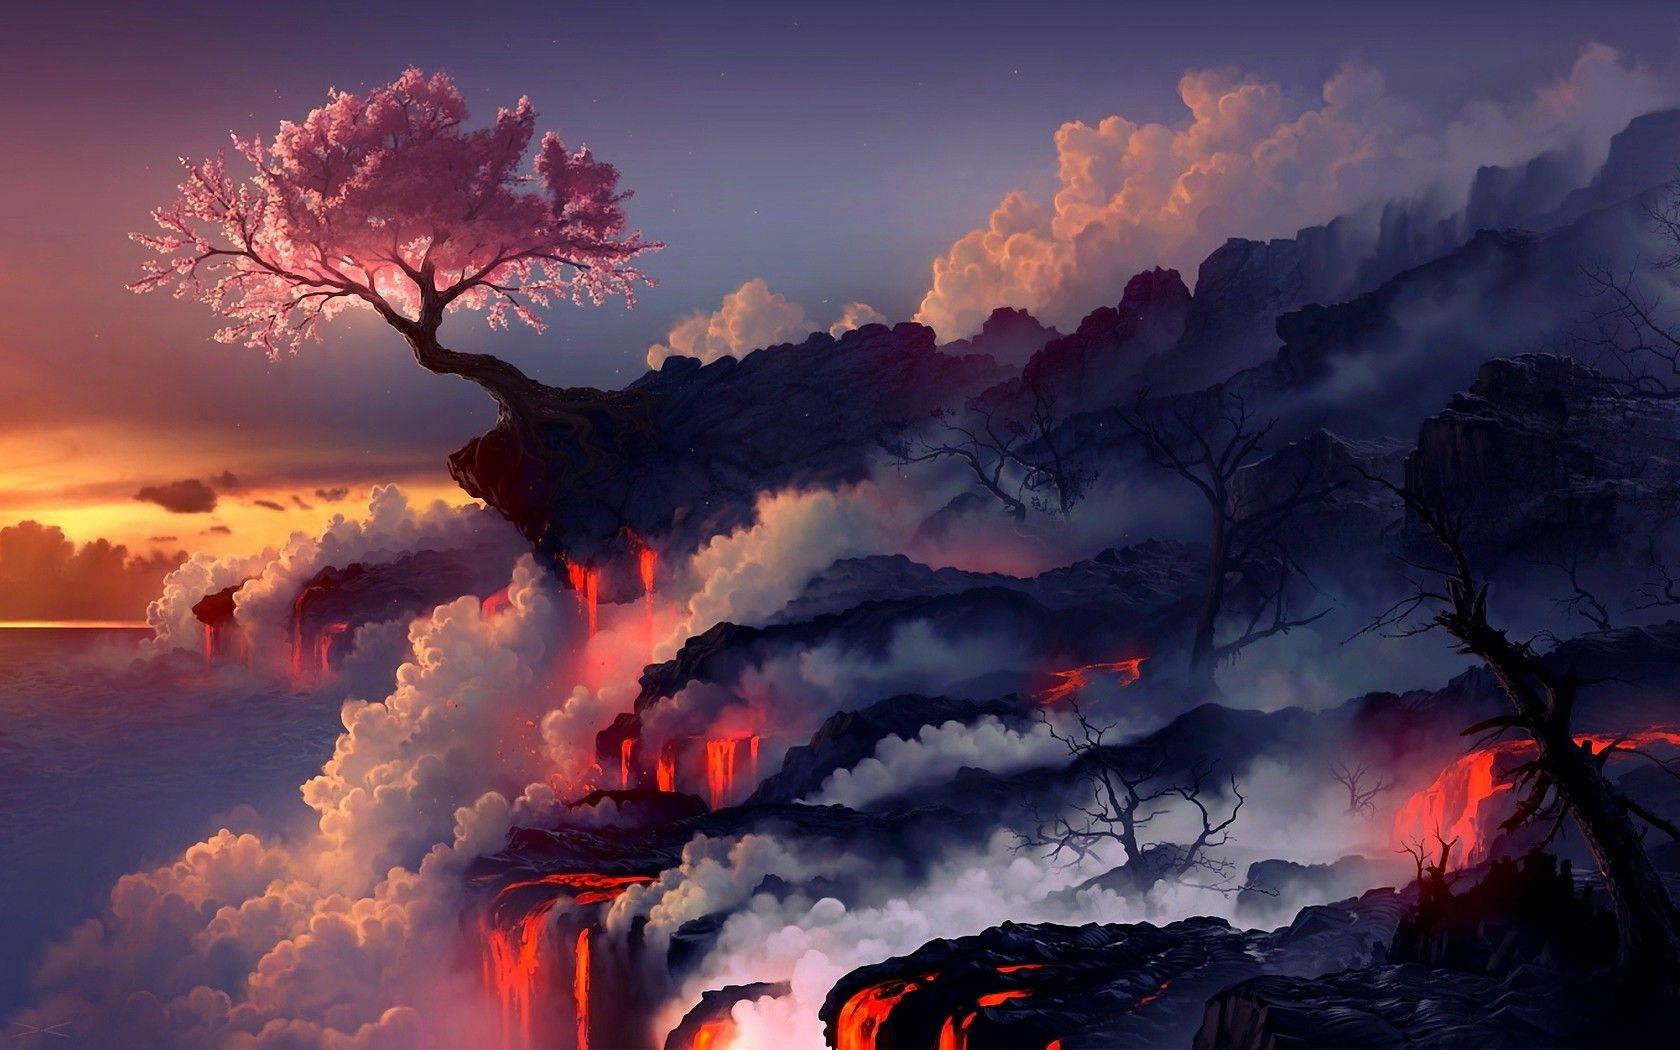 1680x1050 nature landscape fantasy art fire trees smoke